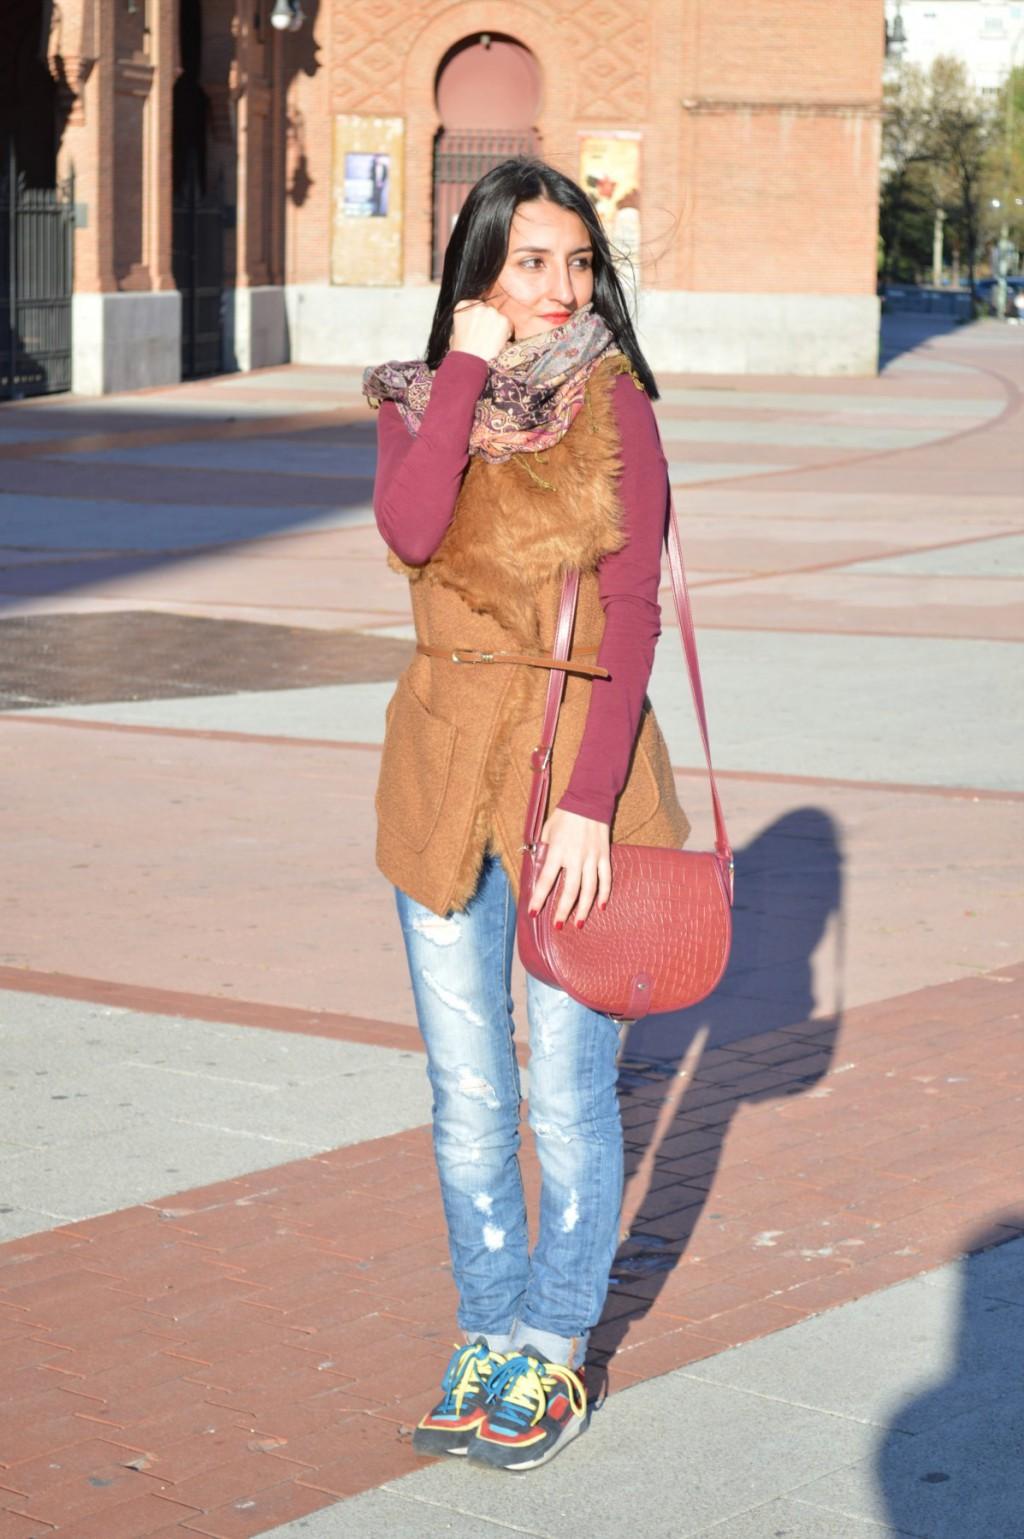 Chaleco / waistcoat: Sfera Jersey: H&M Jeans: Mango Sneakers: Zara Bolso / bag: Bershka Colgante / necklace: Sfera Pasmina: tienda local Roma / Roma local store